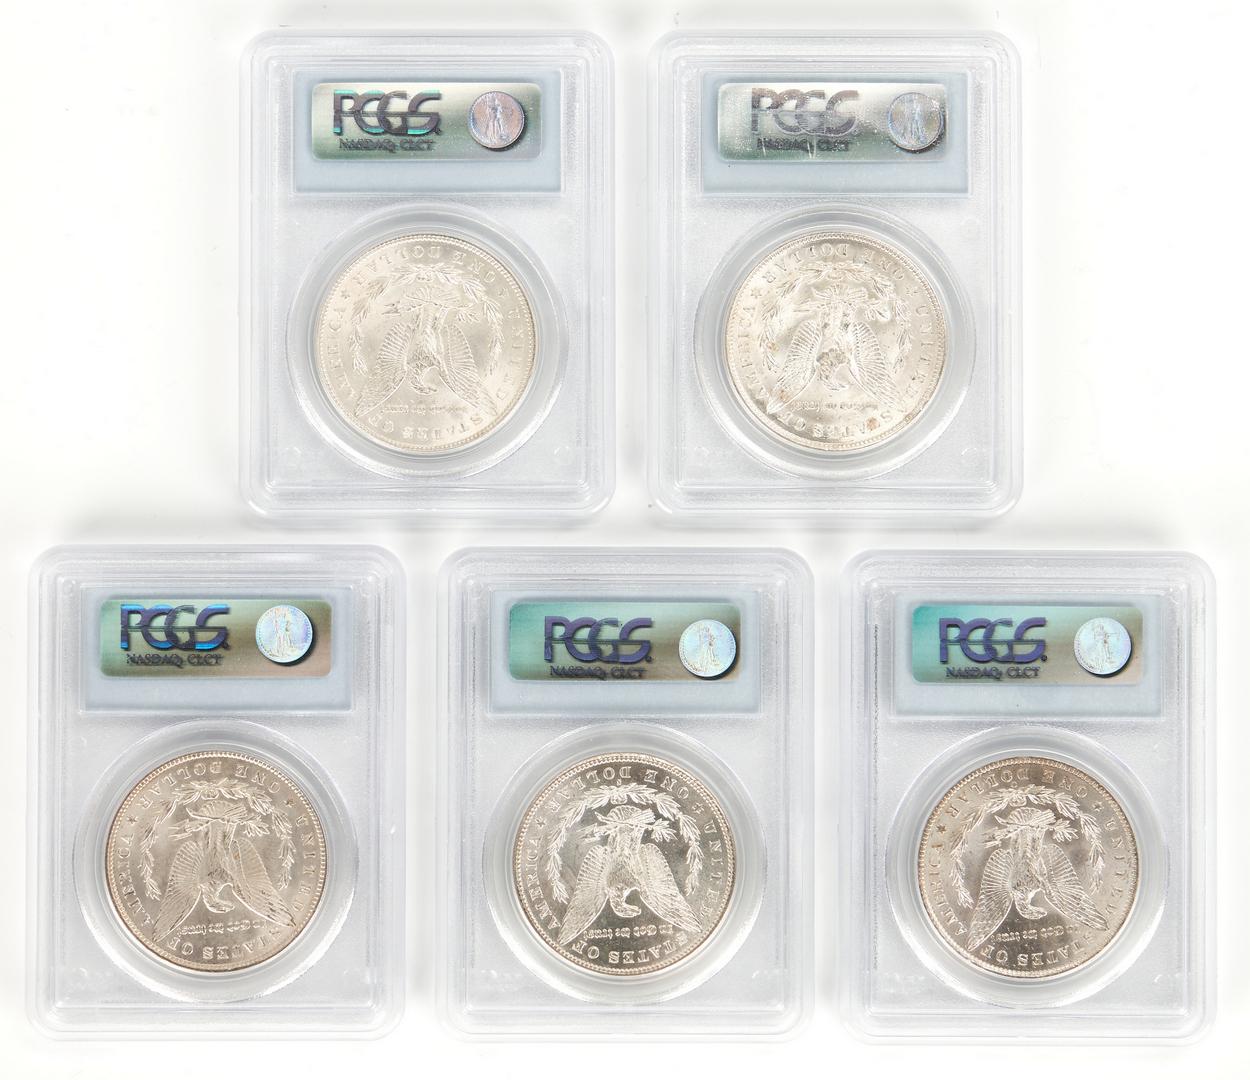 Lot 765: 10 PCGS Graded Morgan Silver Dollars, incl. MS63